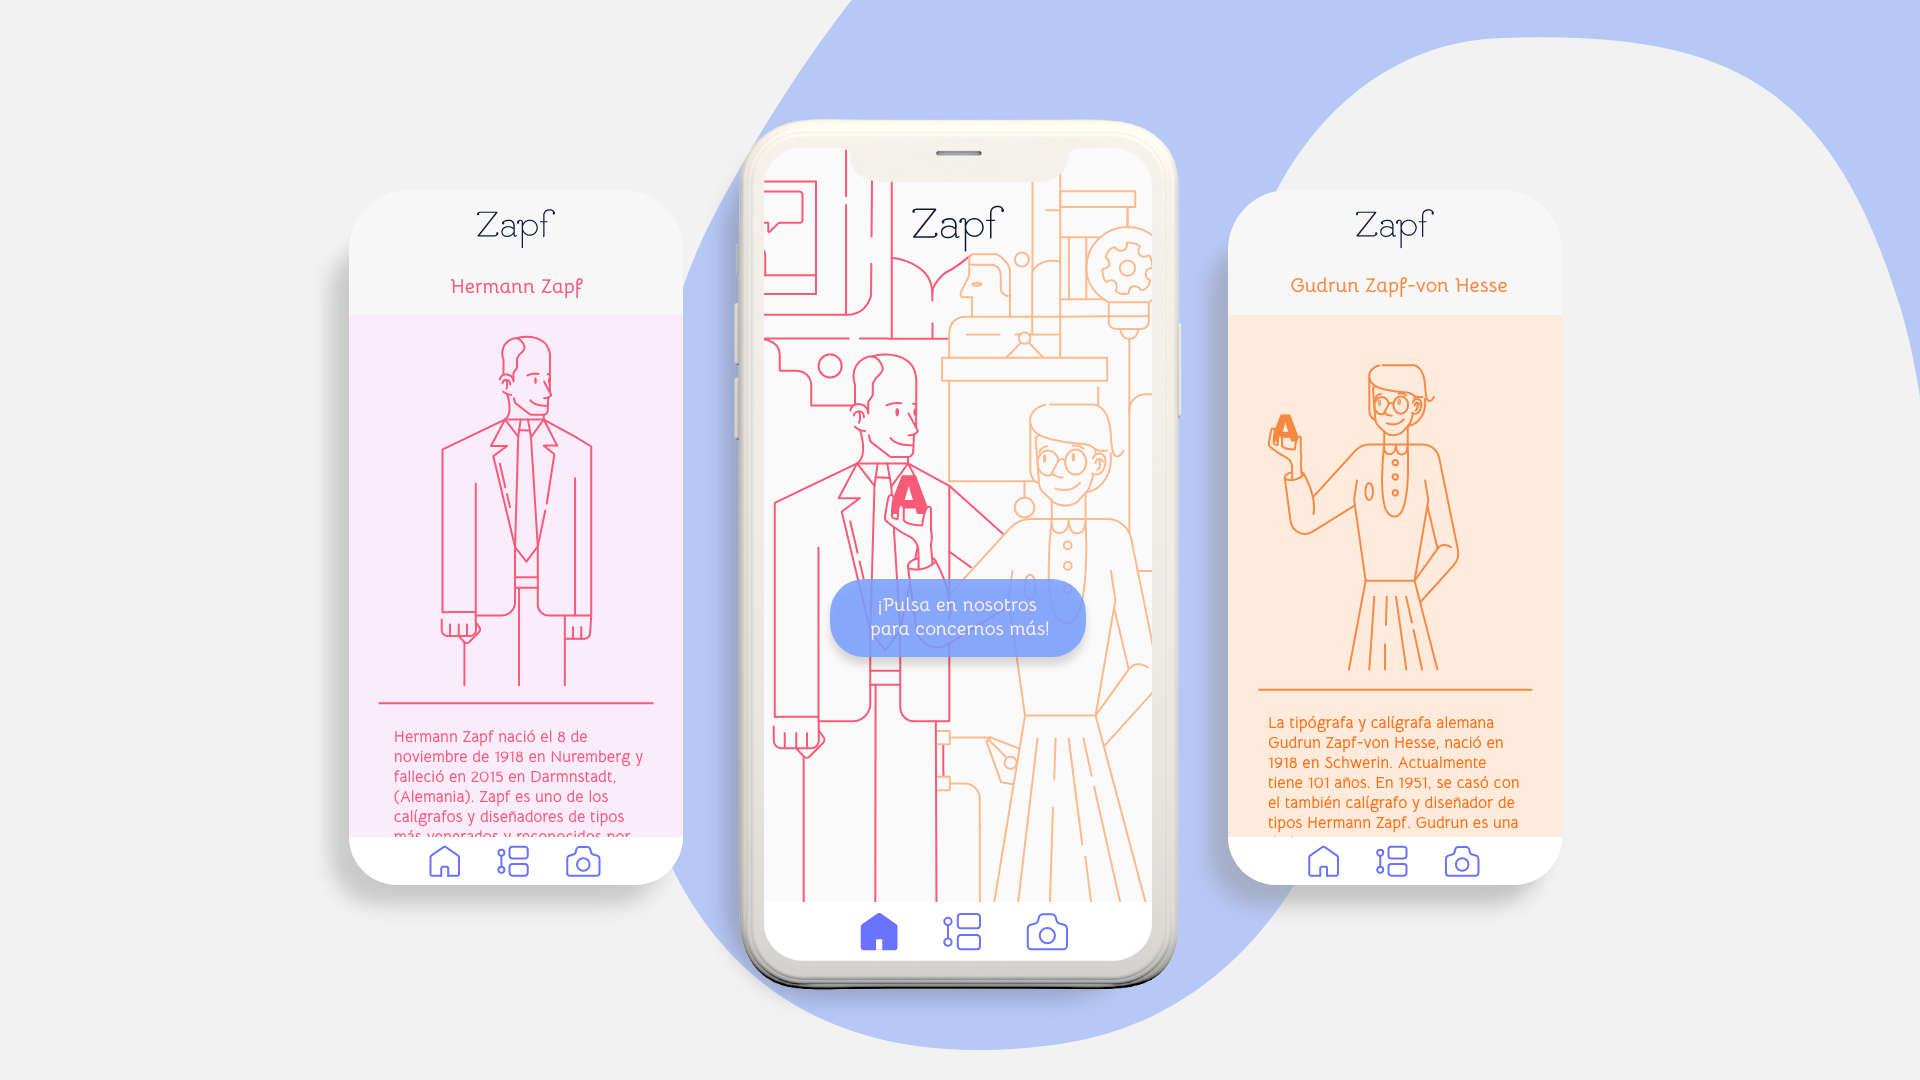 Los Zapf | Diseño UI/UX by Ana Alcubierre, Garbiñe Herreros, Maitane Bautista - Creative Work